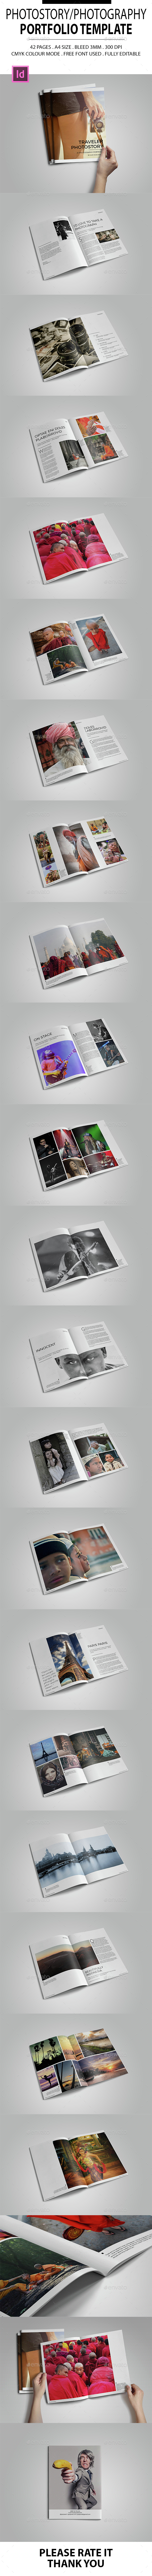 Photostory/Photography Portfolio Template - Portfolio Brochures